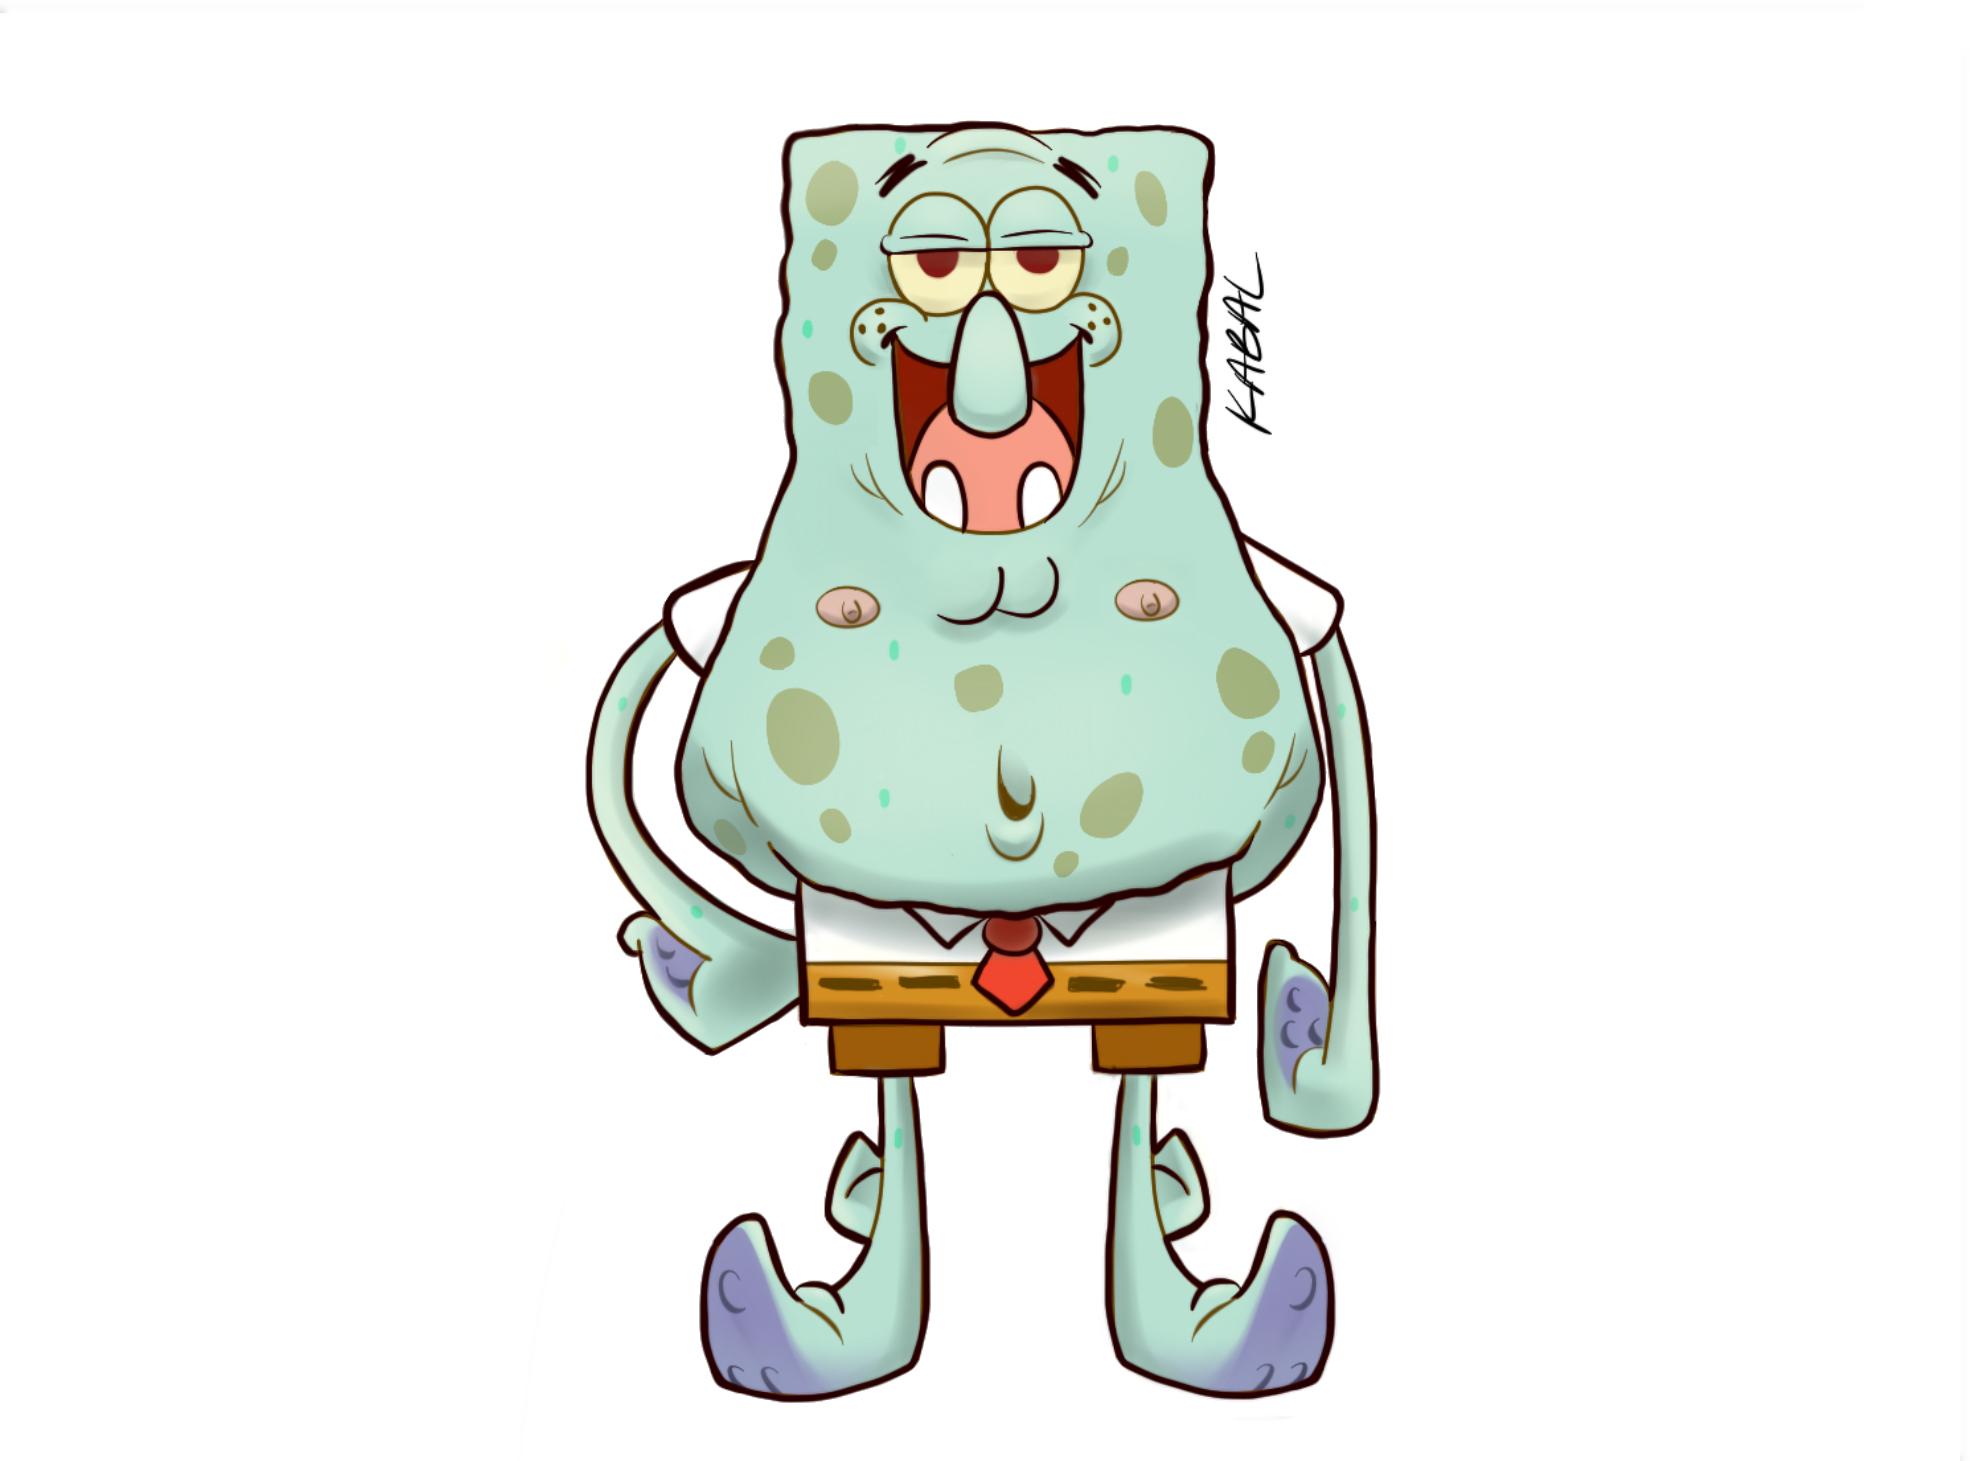 spongebob patrick squidward mashup by kcabal on deviantart